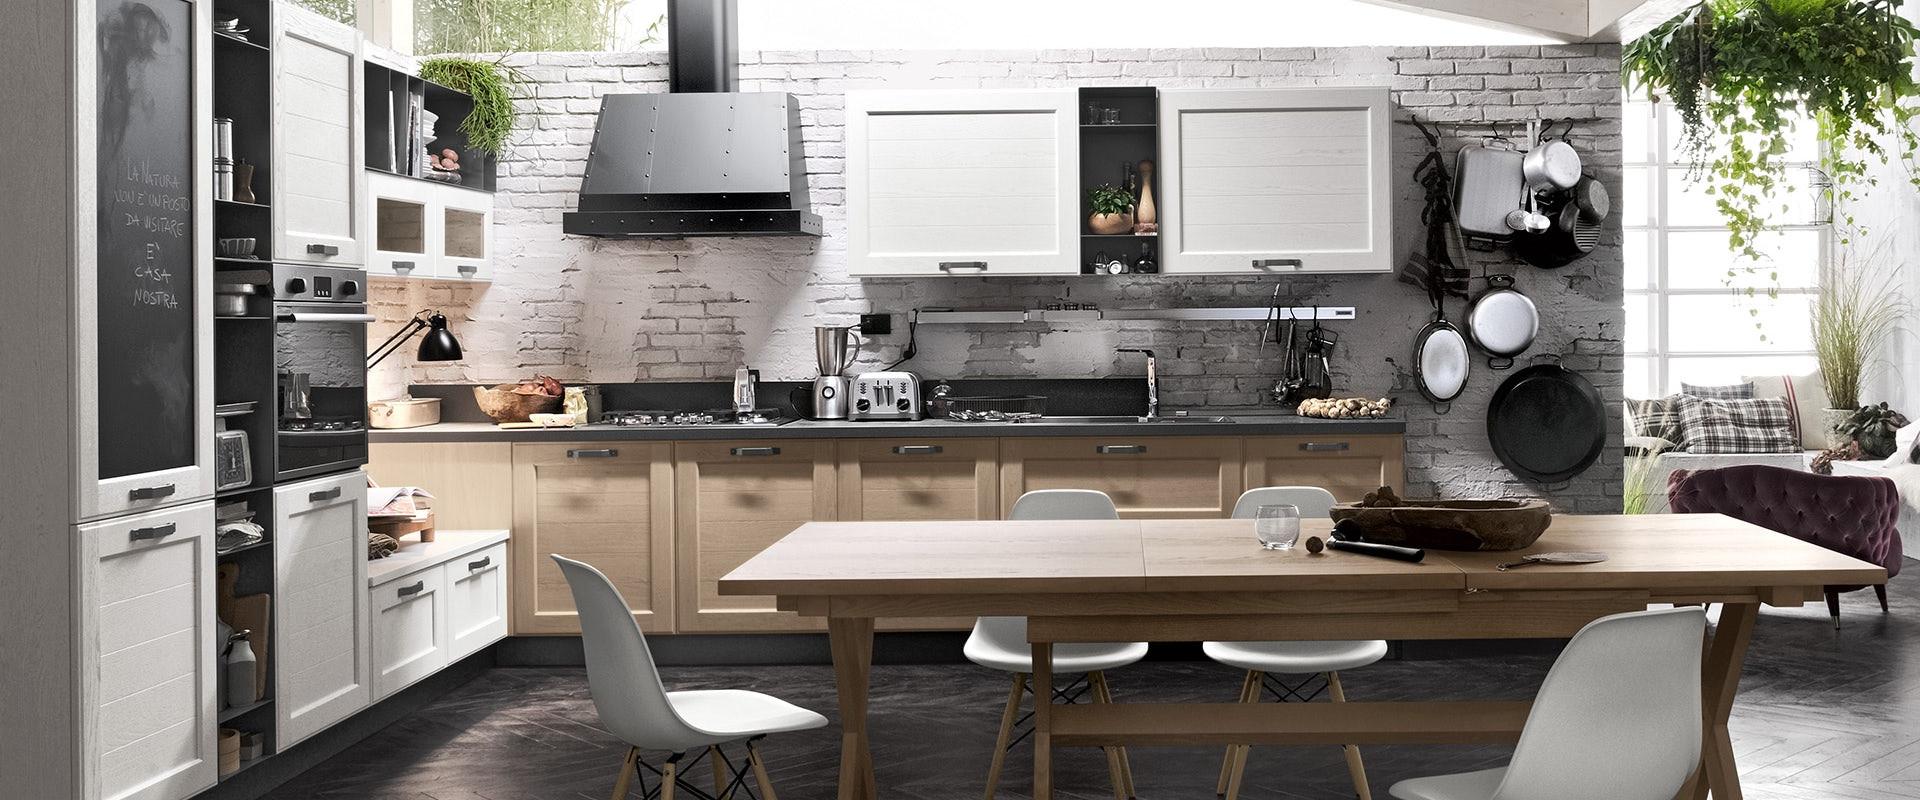 stosa-cucine-classiche-york-221.jpg